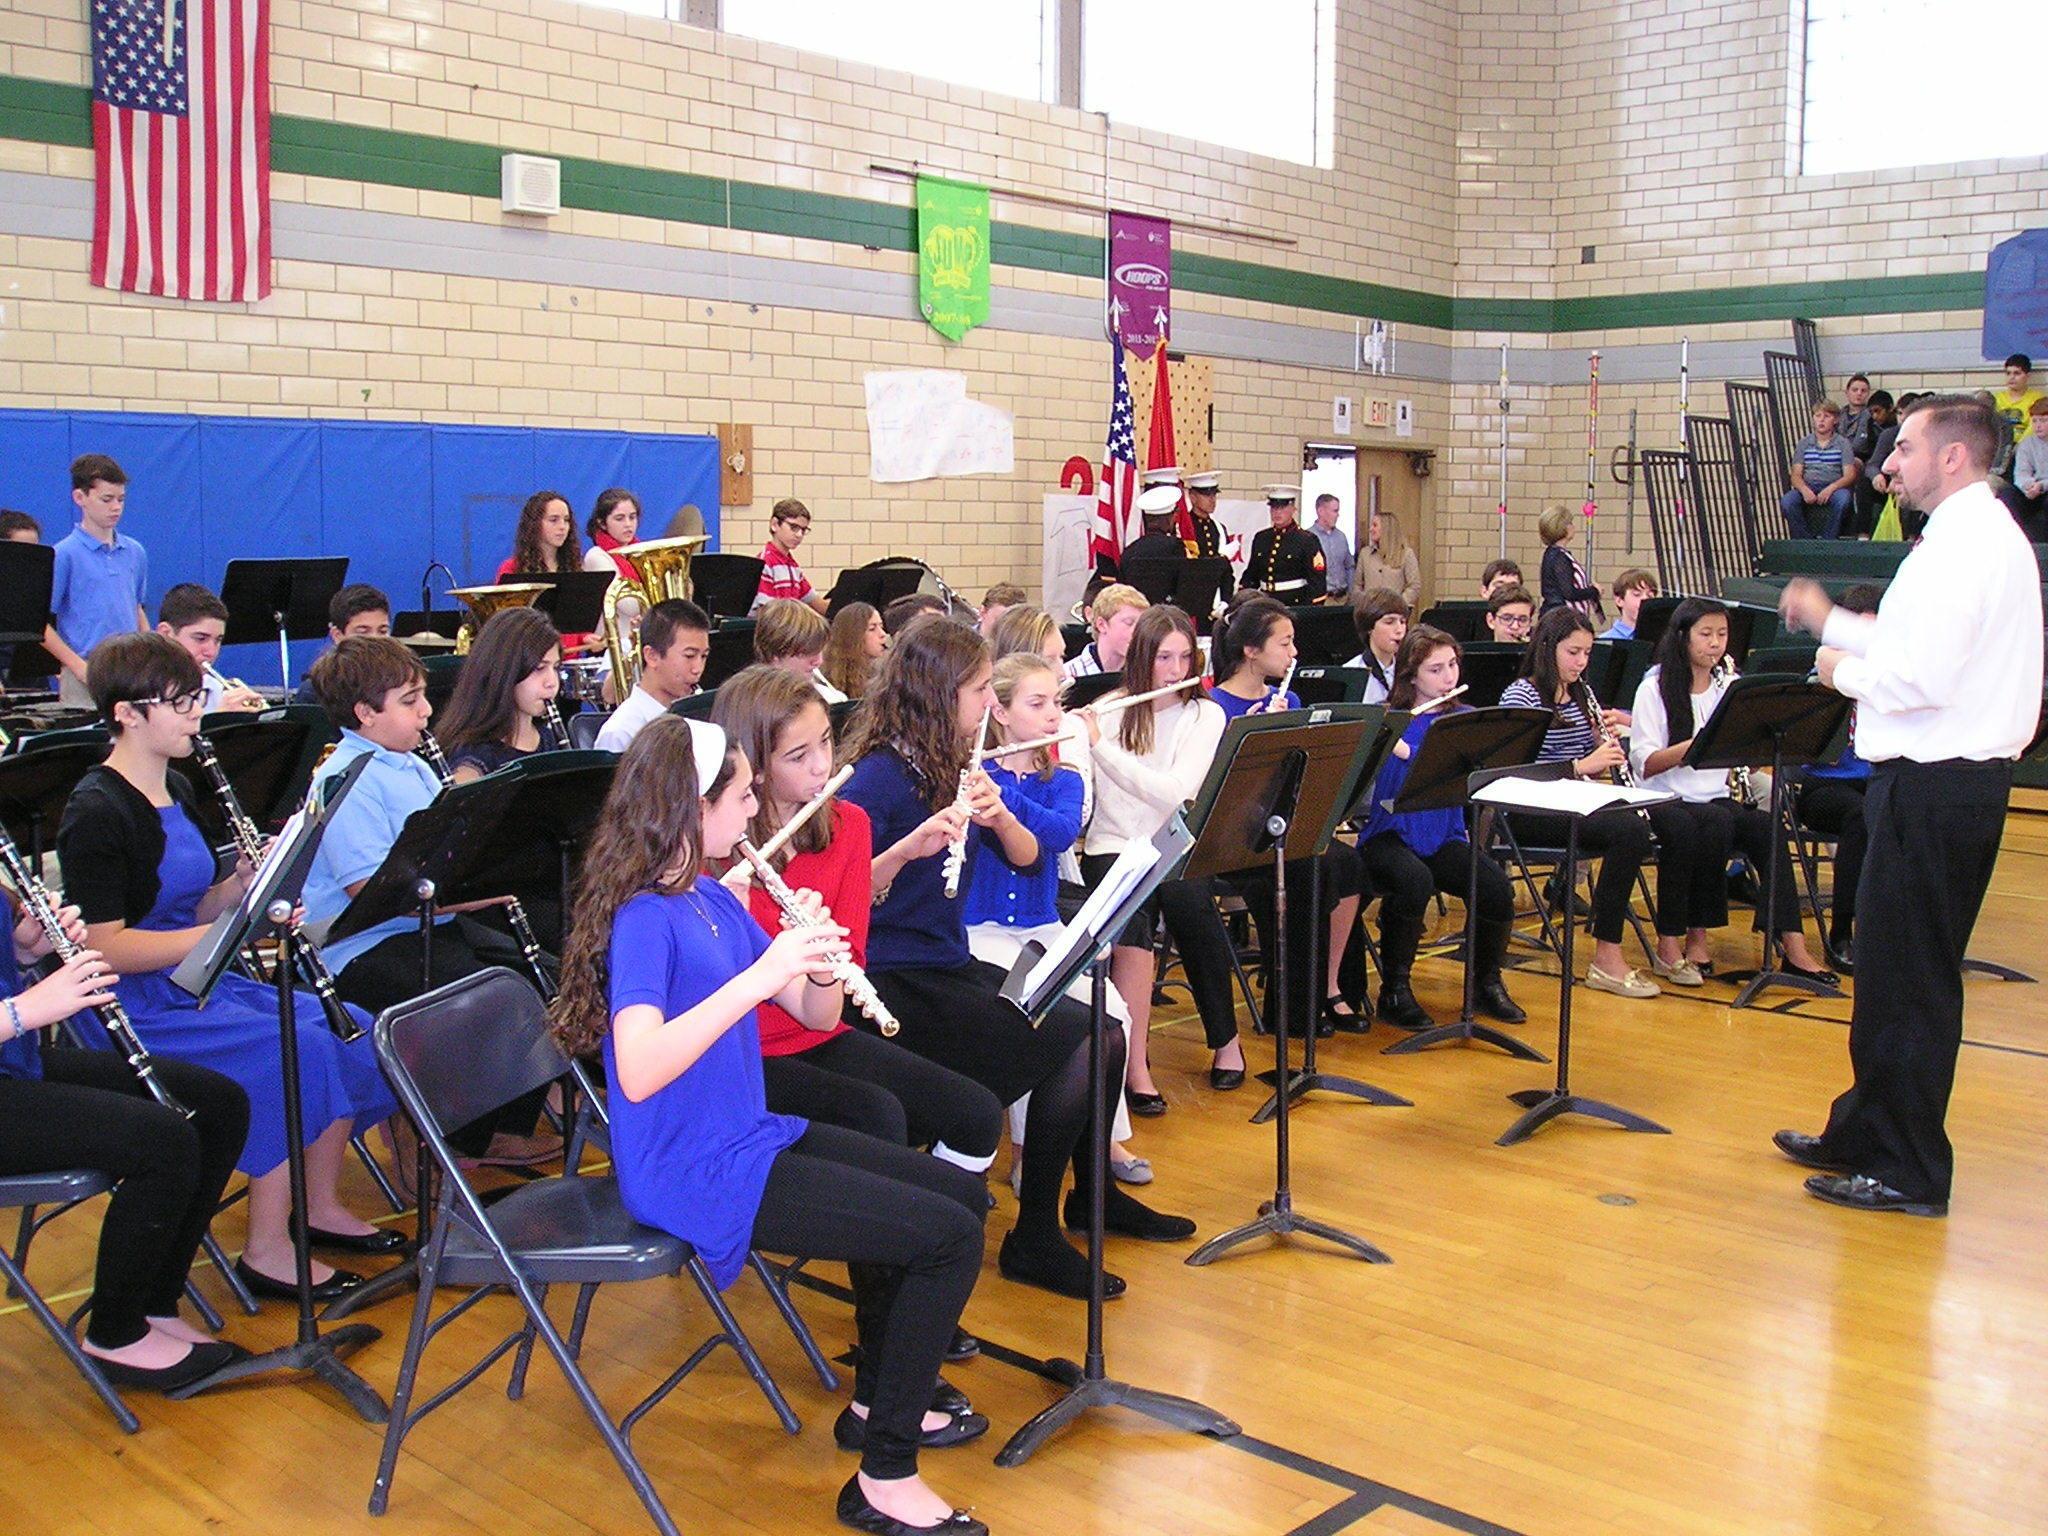 68676c018d6efaaca9aa_EIS_band_teacher_John_Scozarro_conducts_Concert_Band_at_Vets_Assembly.JPG